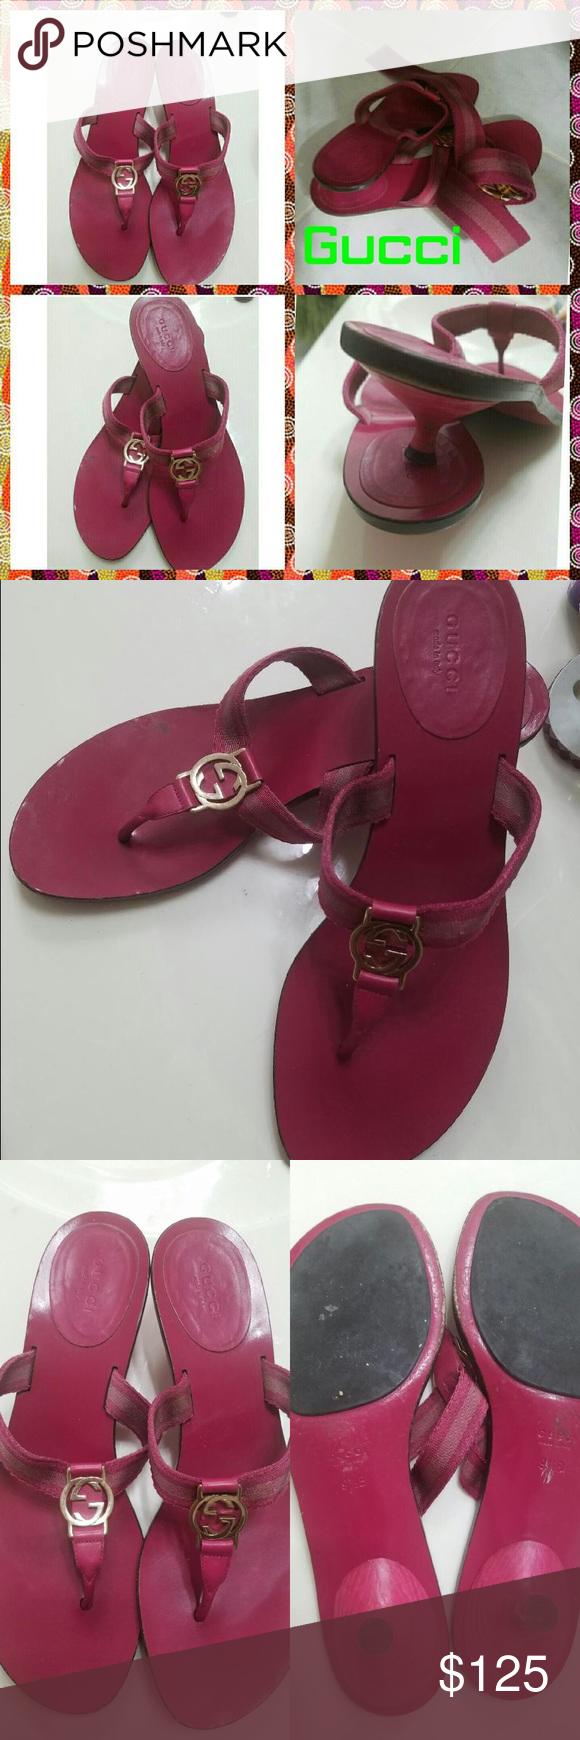 e80dbabd1 Pink Gucci ribbon thong sandal Authentic pink ribbon thong GG Gucci sandal  kitten heel with metal GG on ribbon. Black sole barely worn size 91 2  matching ...